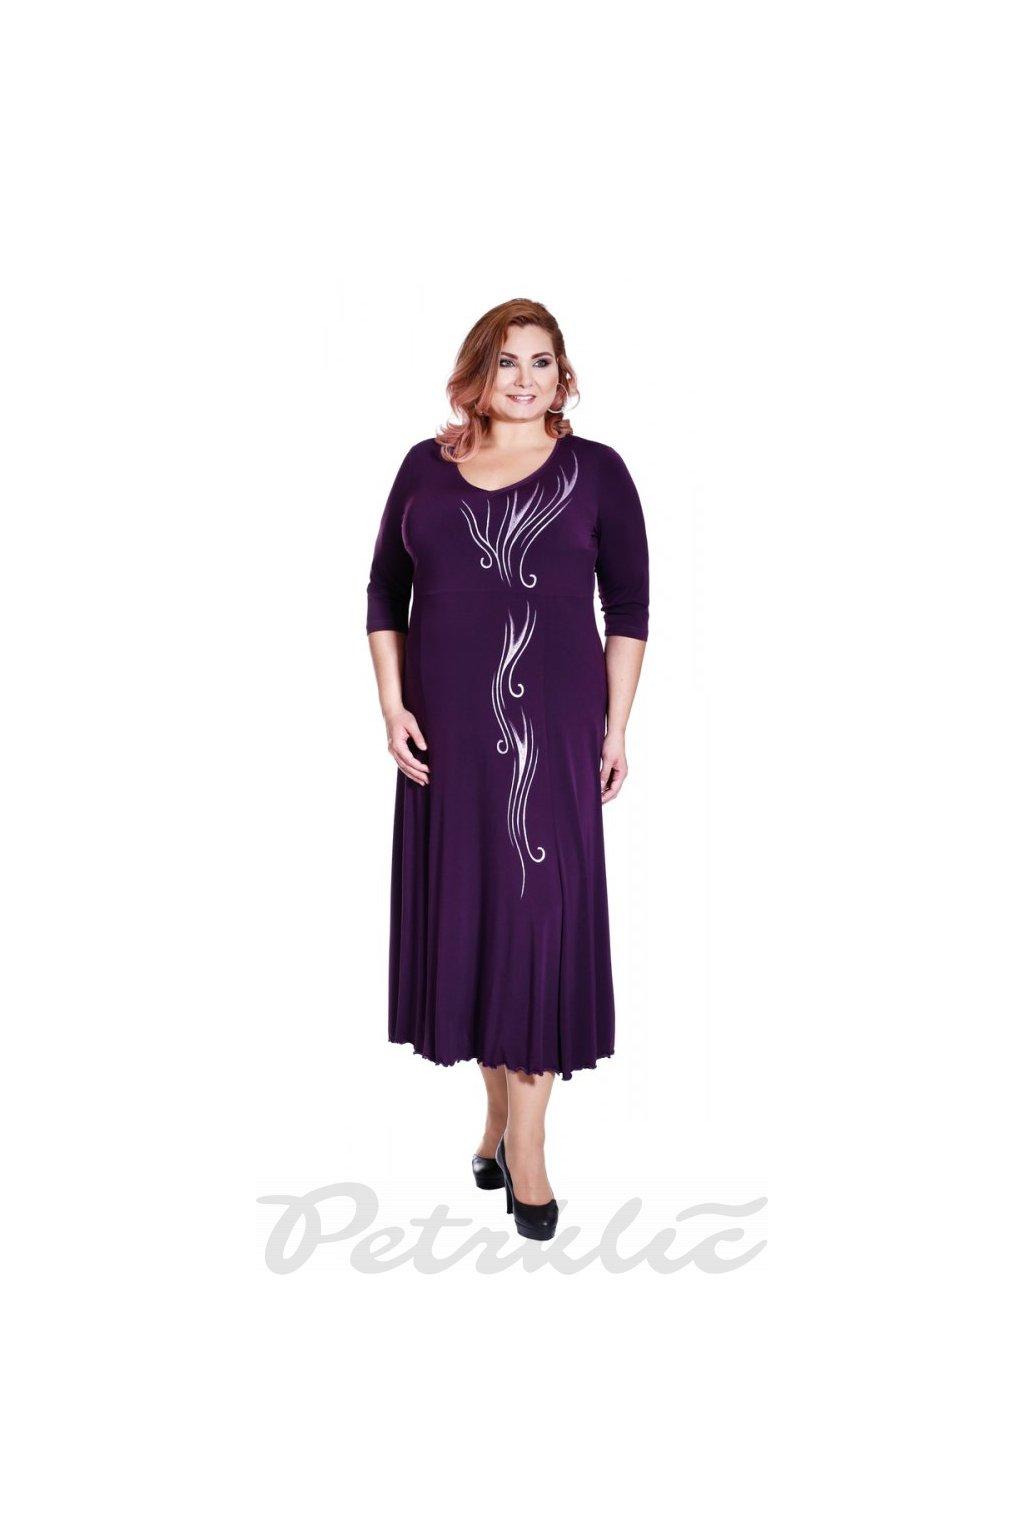 MÁJA - šaty 3/4 rukáv 110 - 115 cm